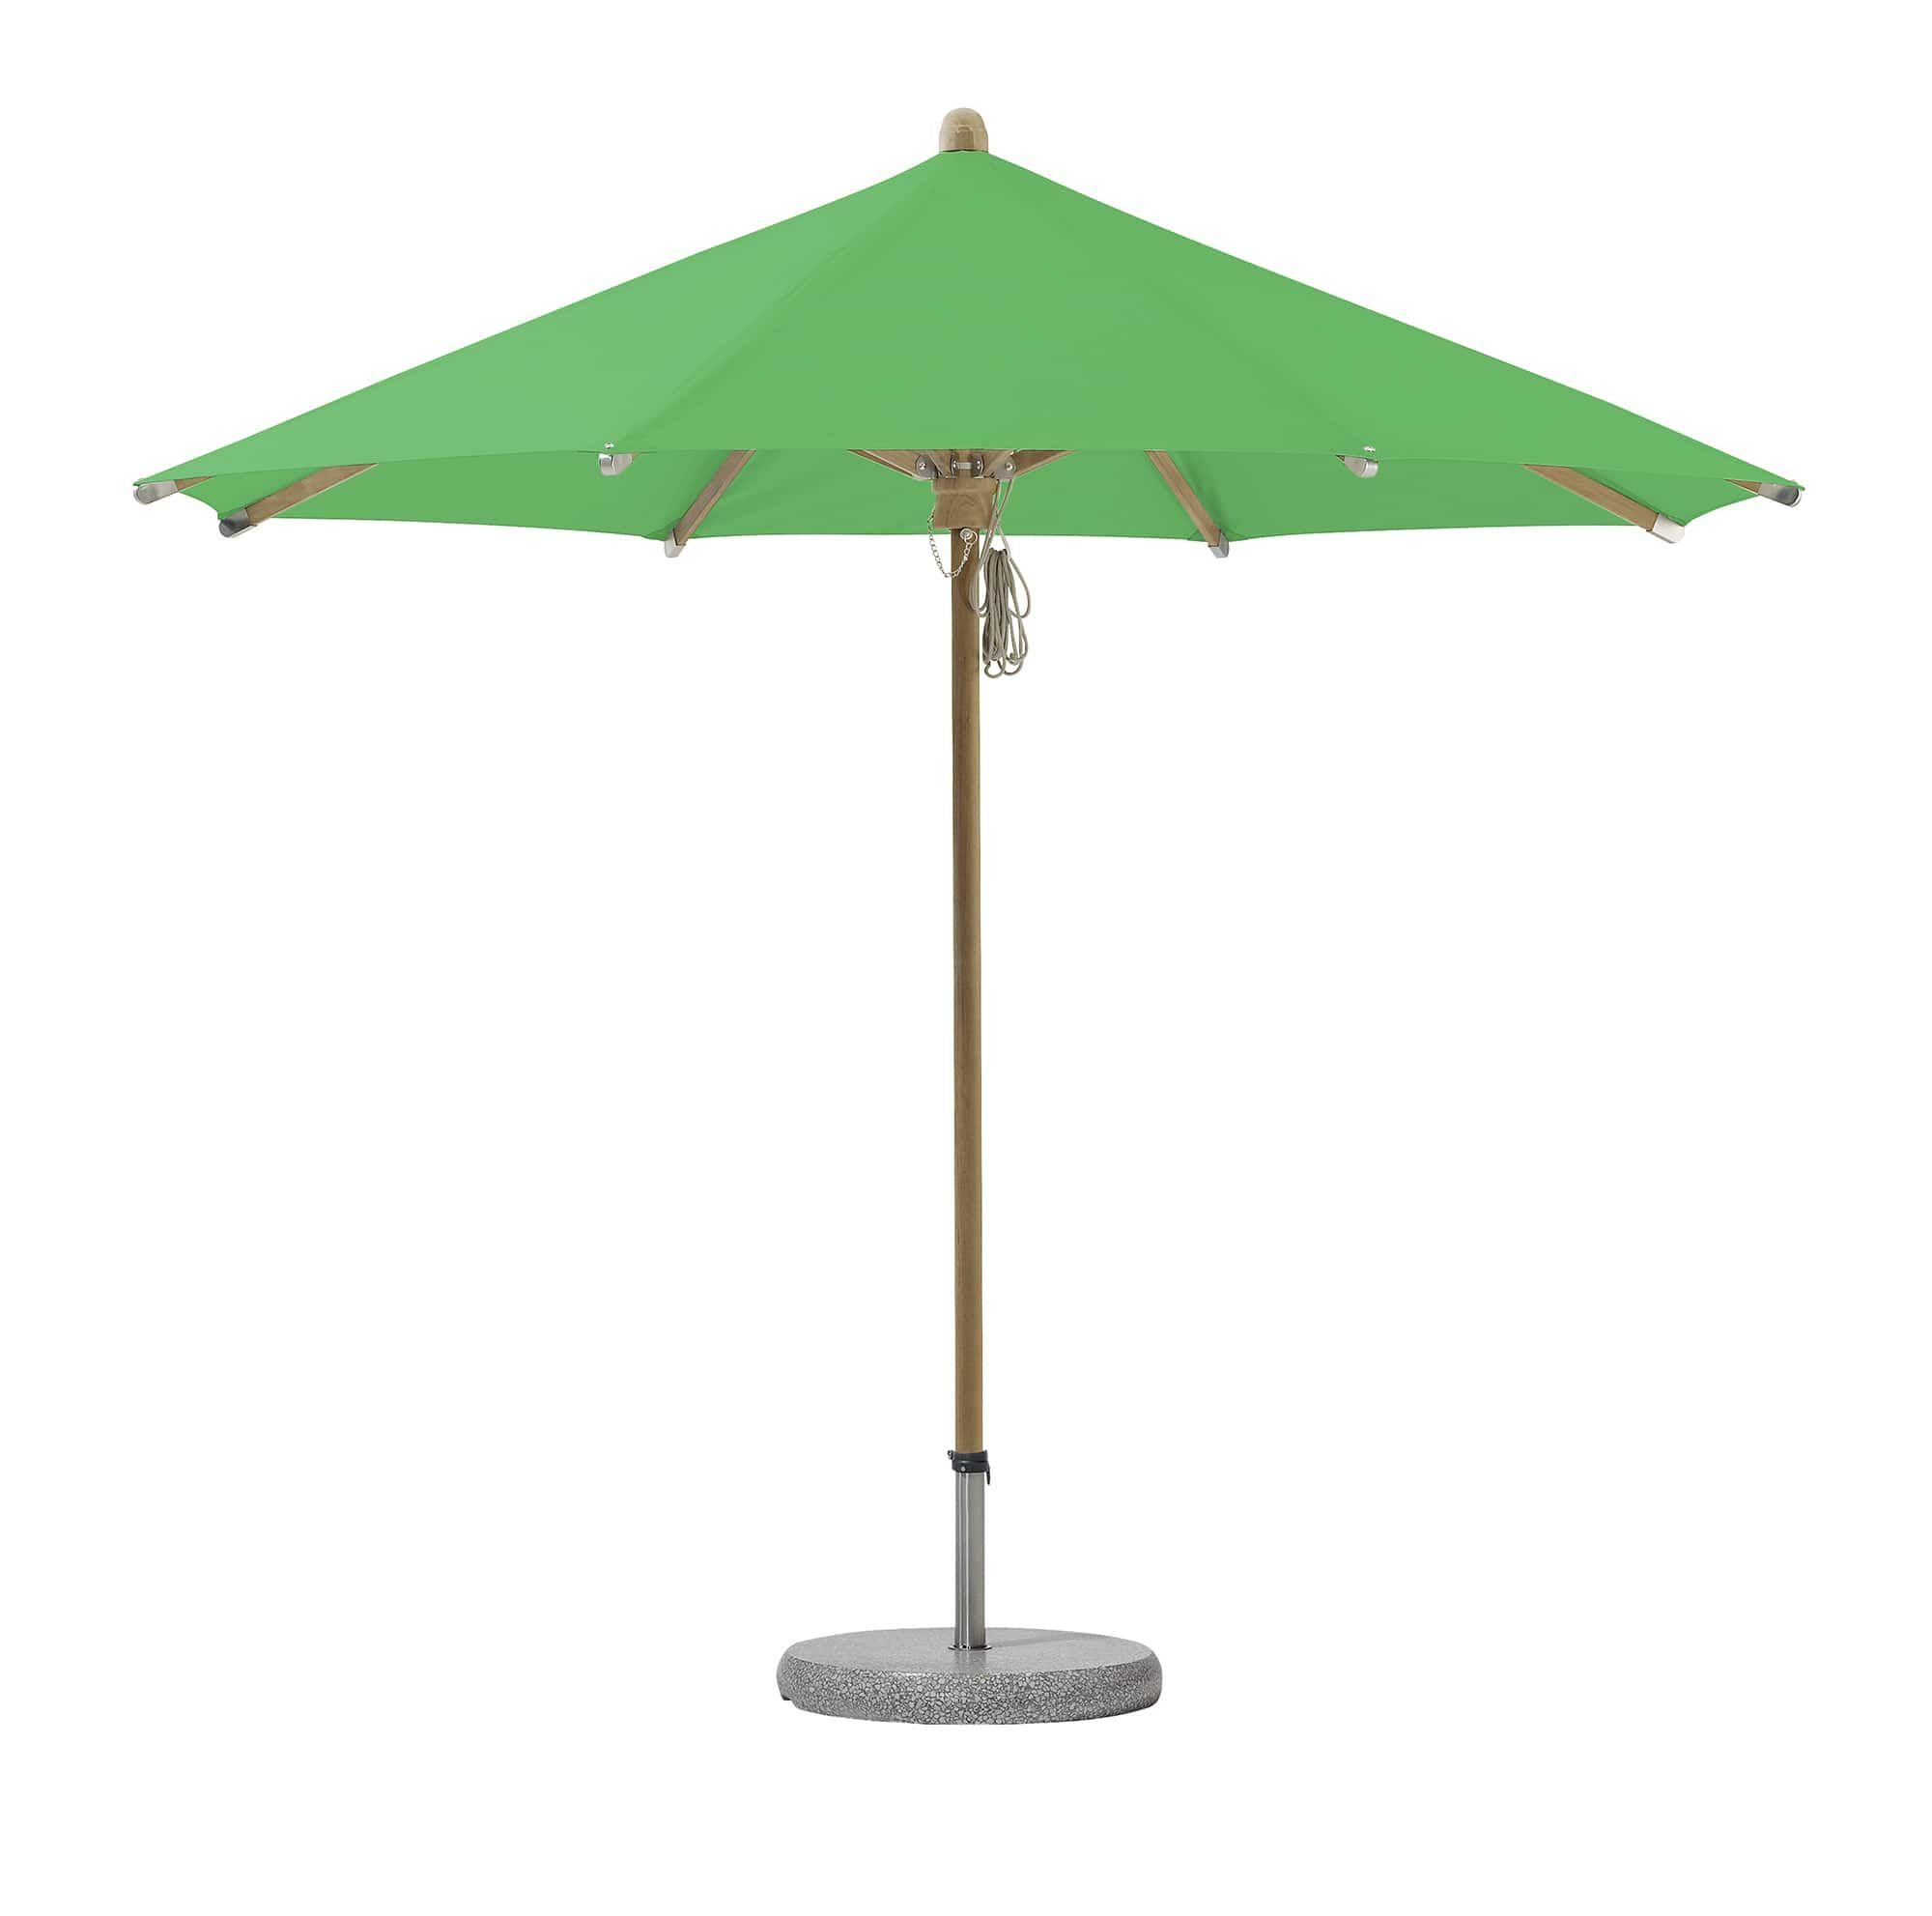 grüner sonnenschirm